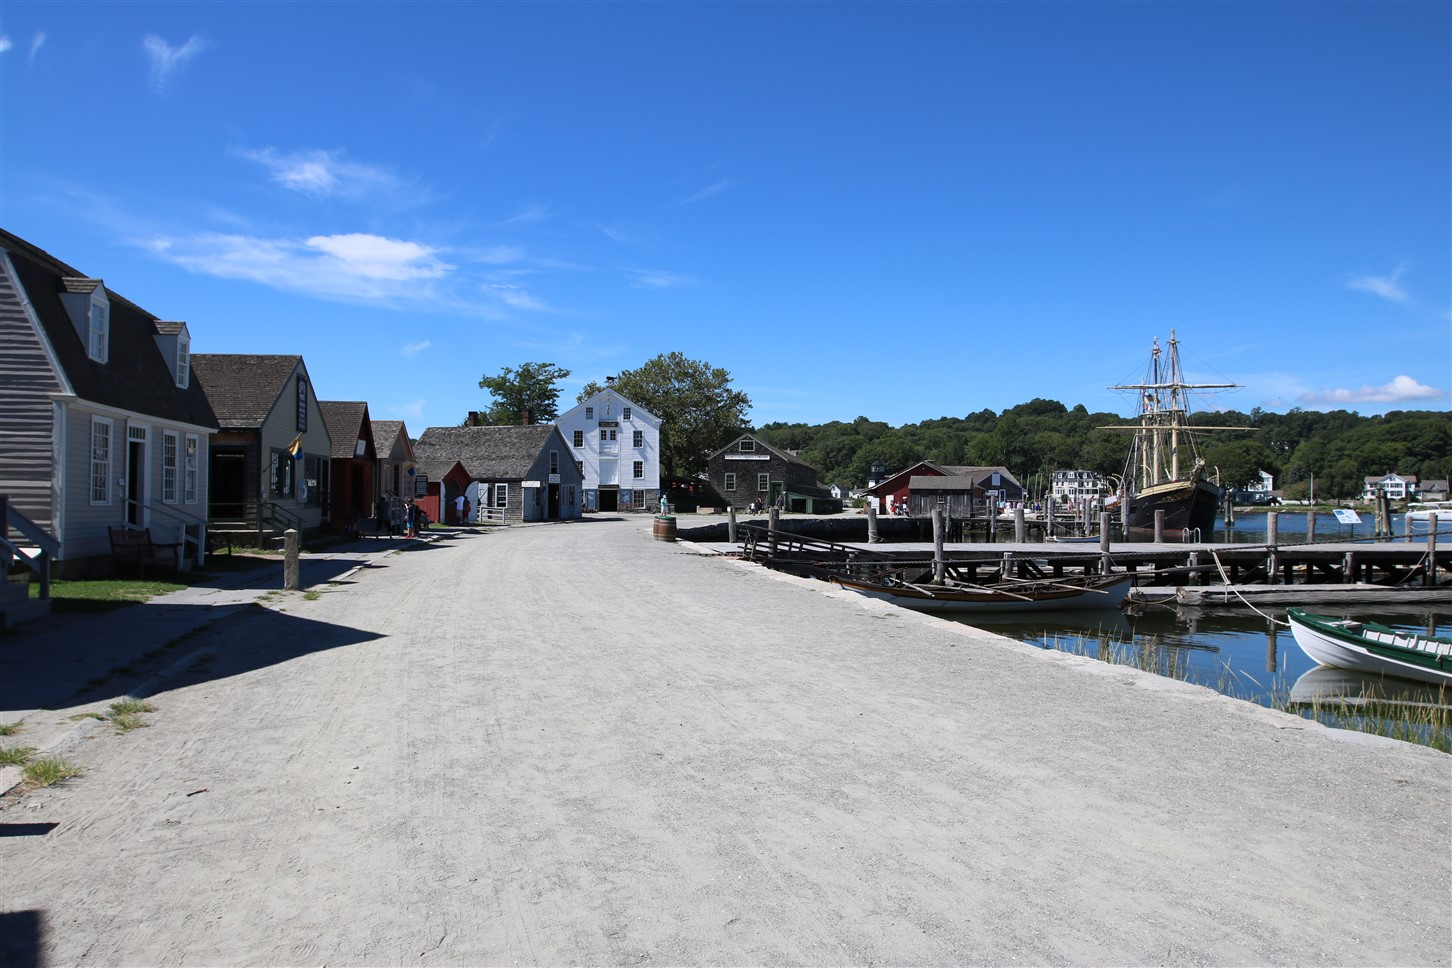 2016 08 30 86 Mystic CT Seaport.jpg